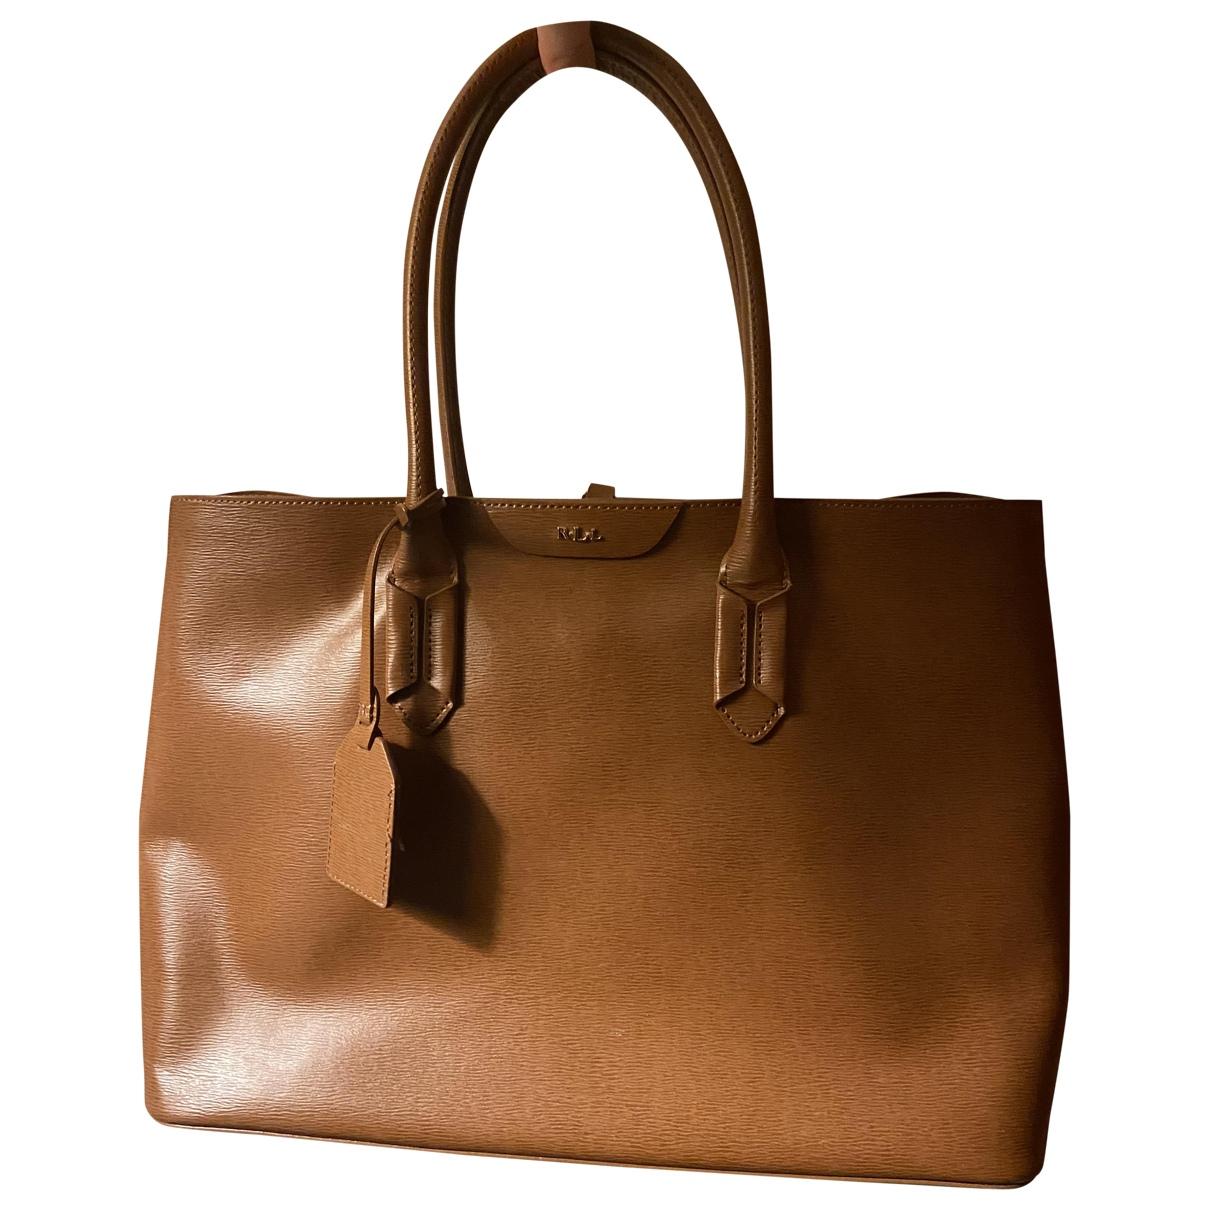 Lauren Ralph Lauren - Sac a main   pour femme en cuir - marron